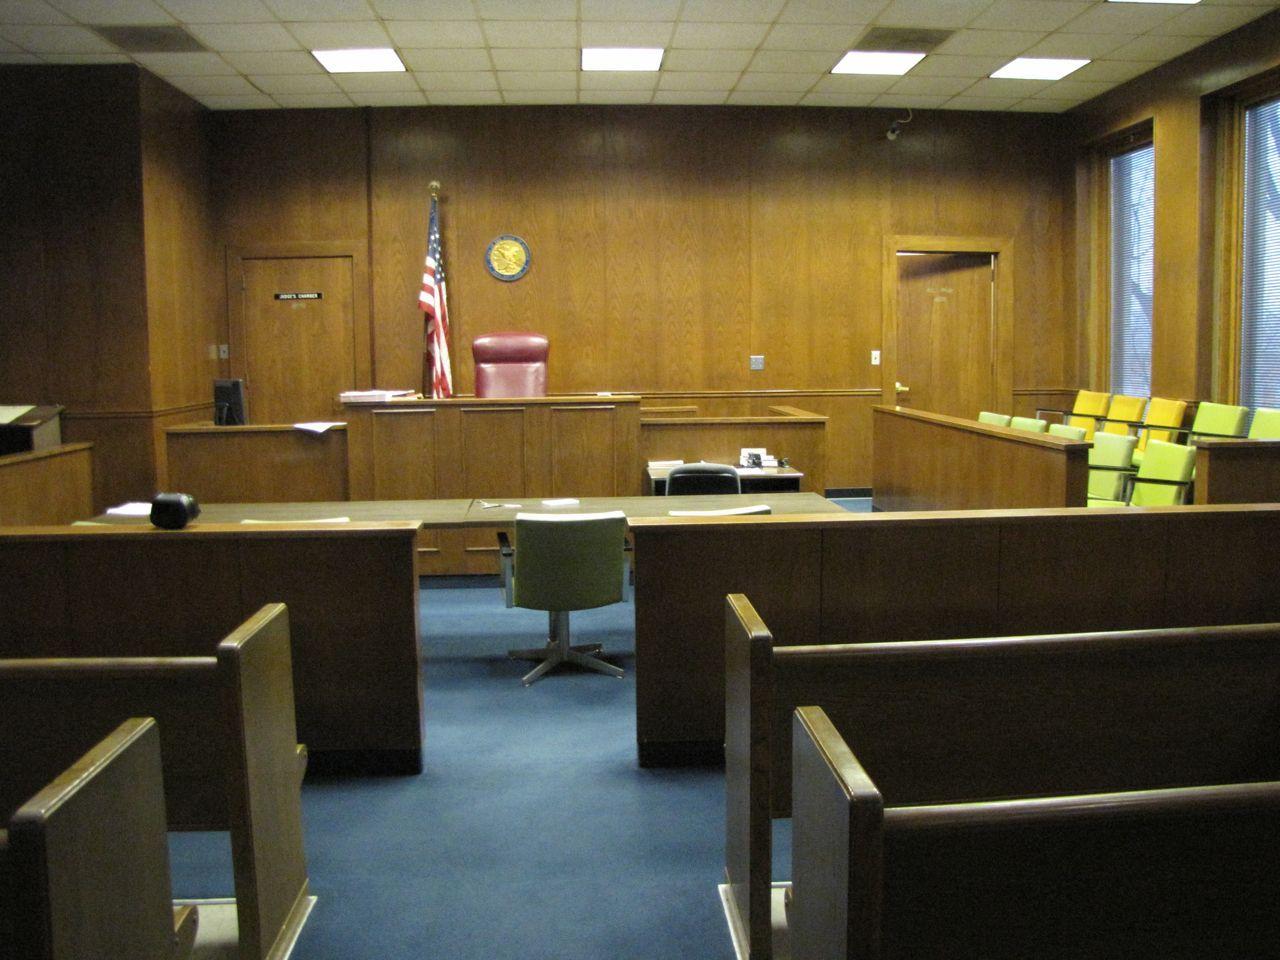 Courtroom C